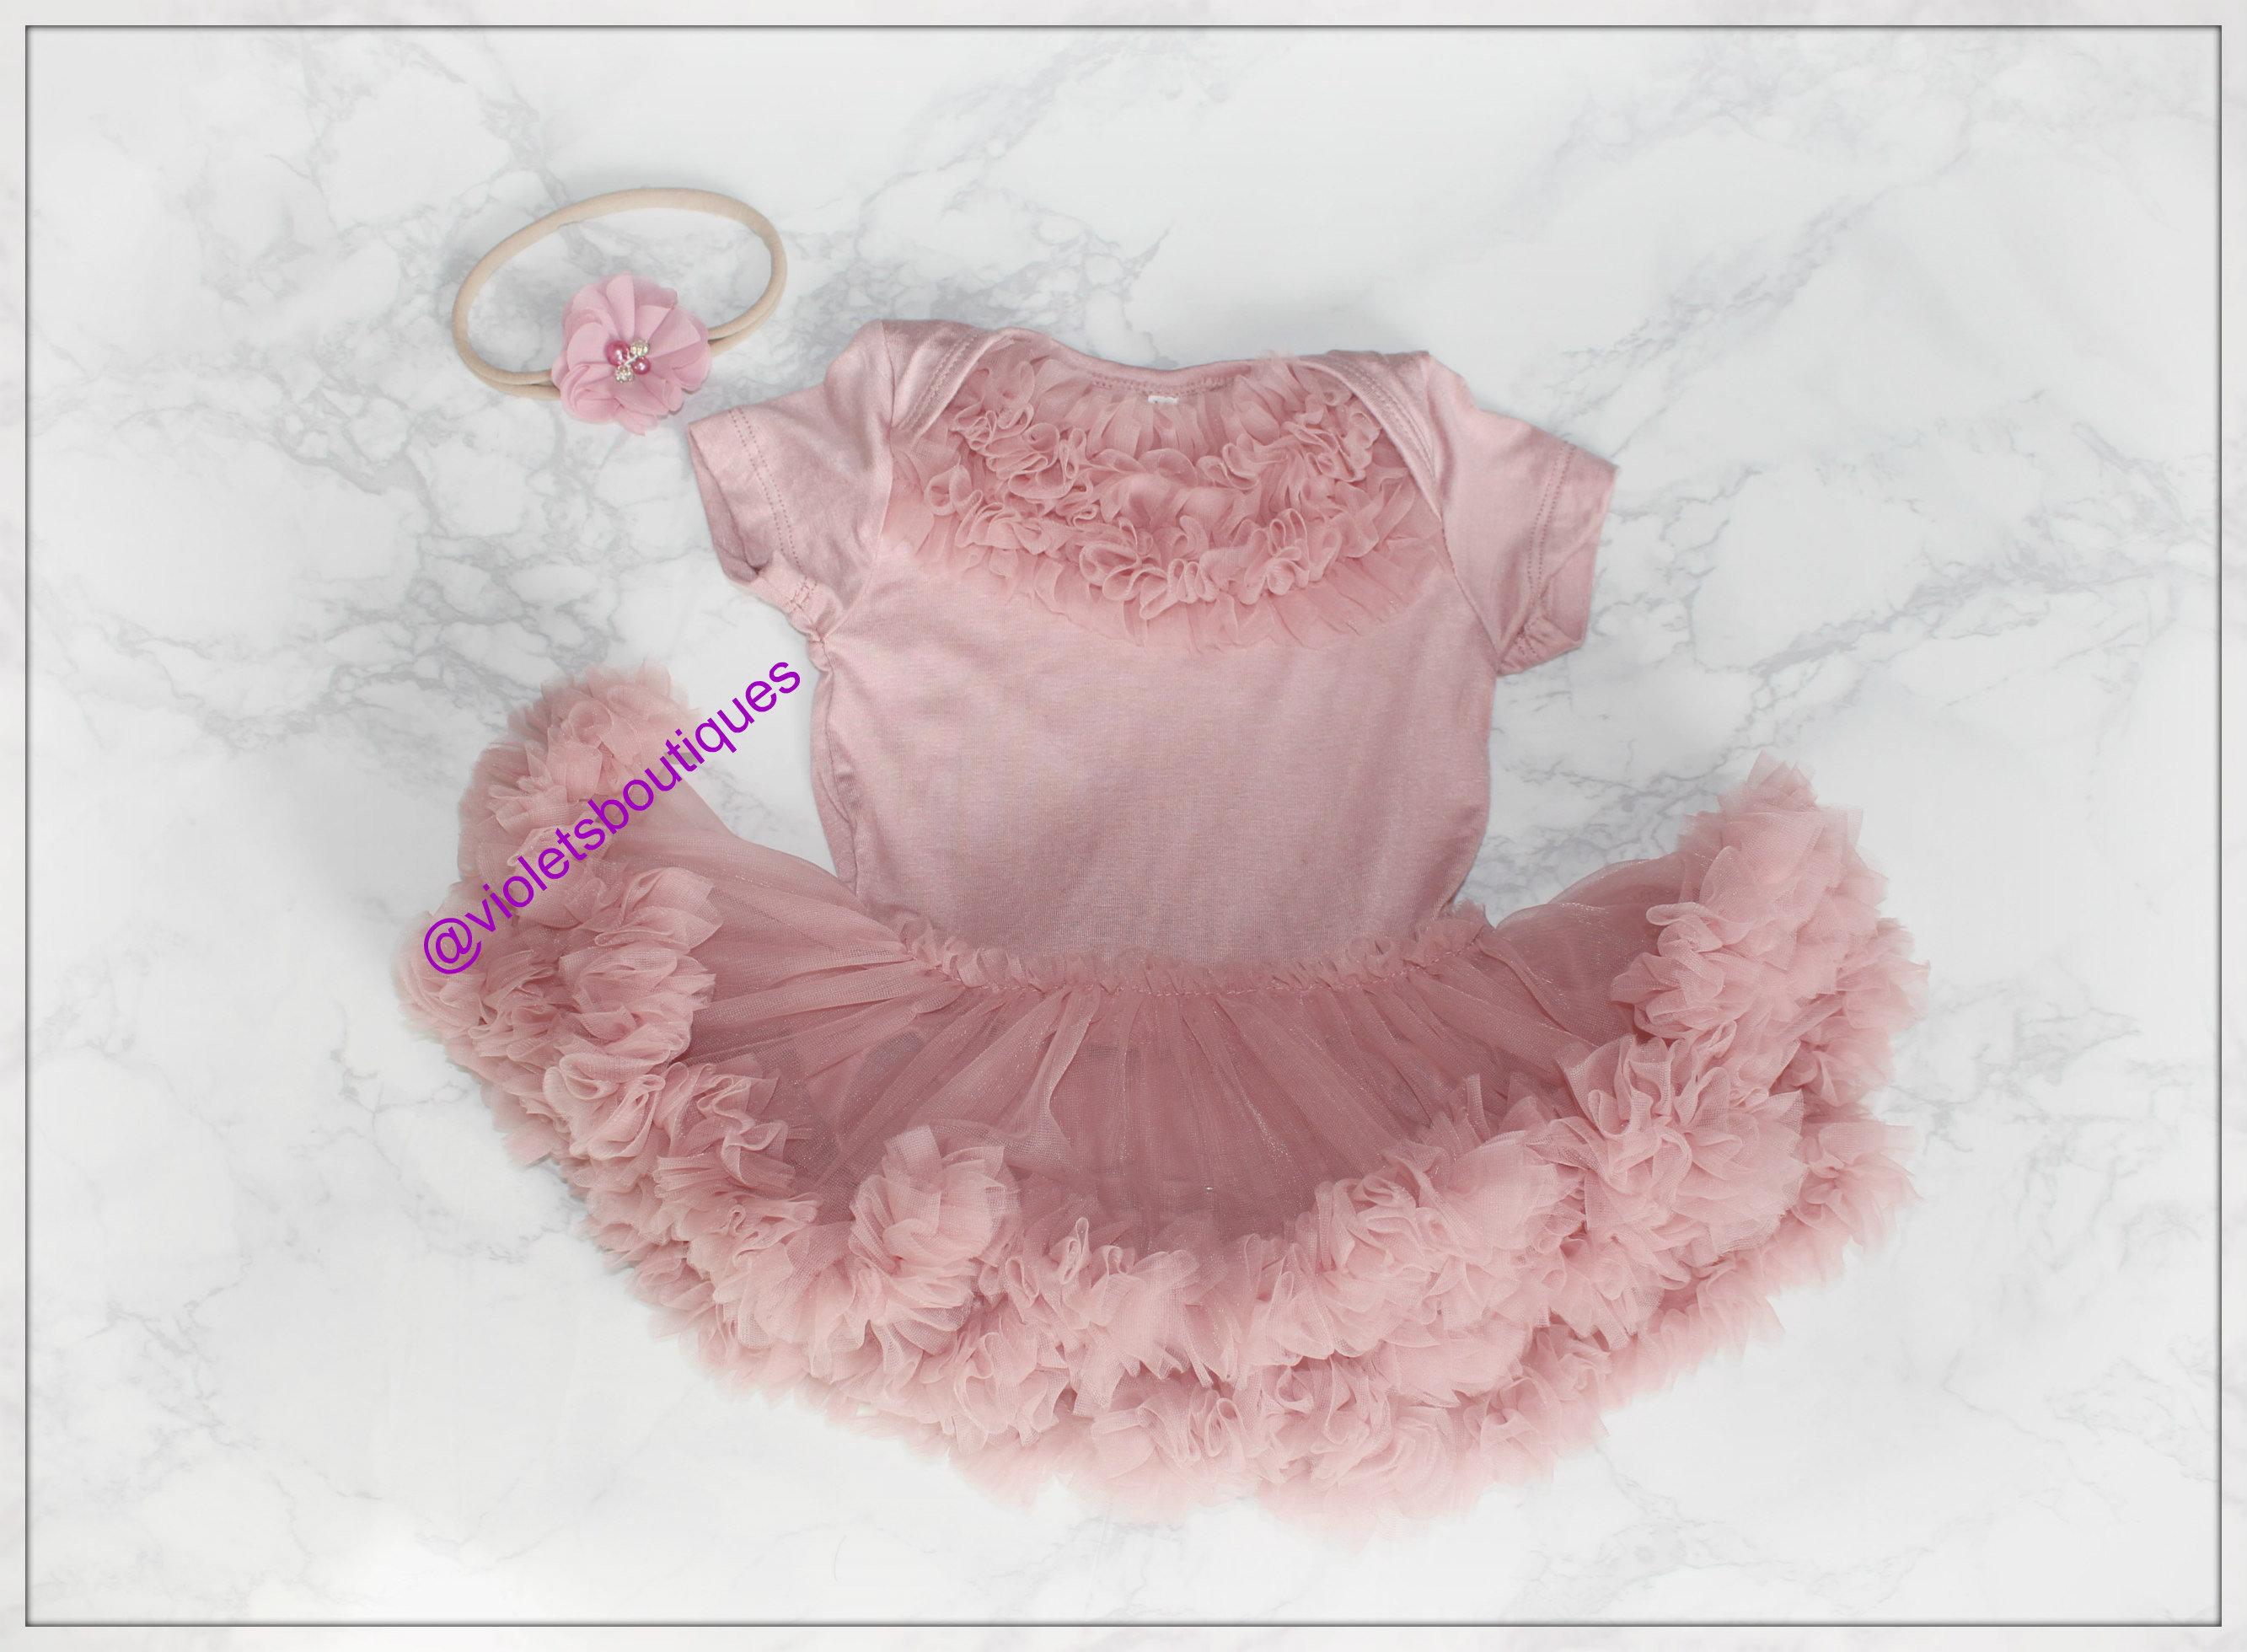 Dusty Pink baby dress tutu dress Birthday outfit take